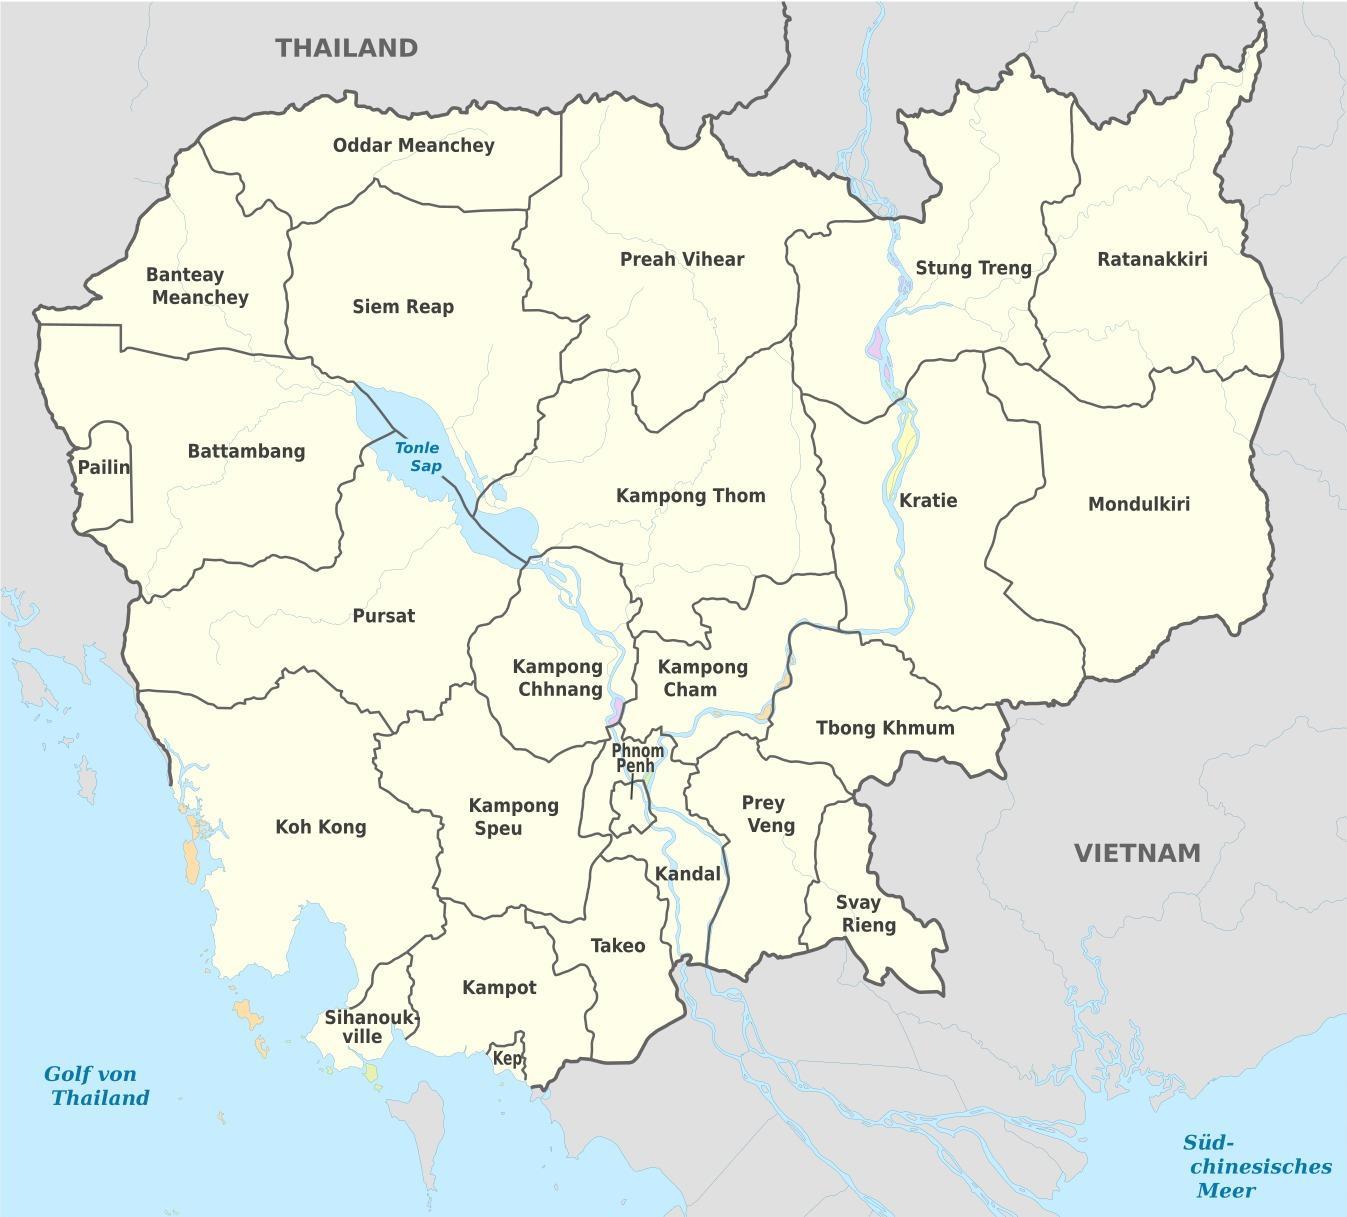 Cambodia map vector - Map of Cambodia vector (South-Eastern ... on el salvador map, syria map, indochina map, chad map, city map, burma map, phillipines map, china map, cameroon map, congo map, west indies map, bangladesh map, africa map, korea map, qatar map, burundi map, martinique map, europe map, japan map, benin map, da nang map, bulgaria map, bhutan map, pacific islands map, east timor map, eritrea map,